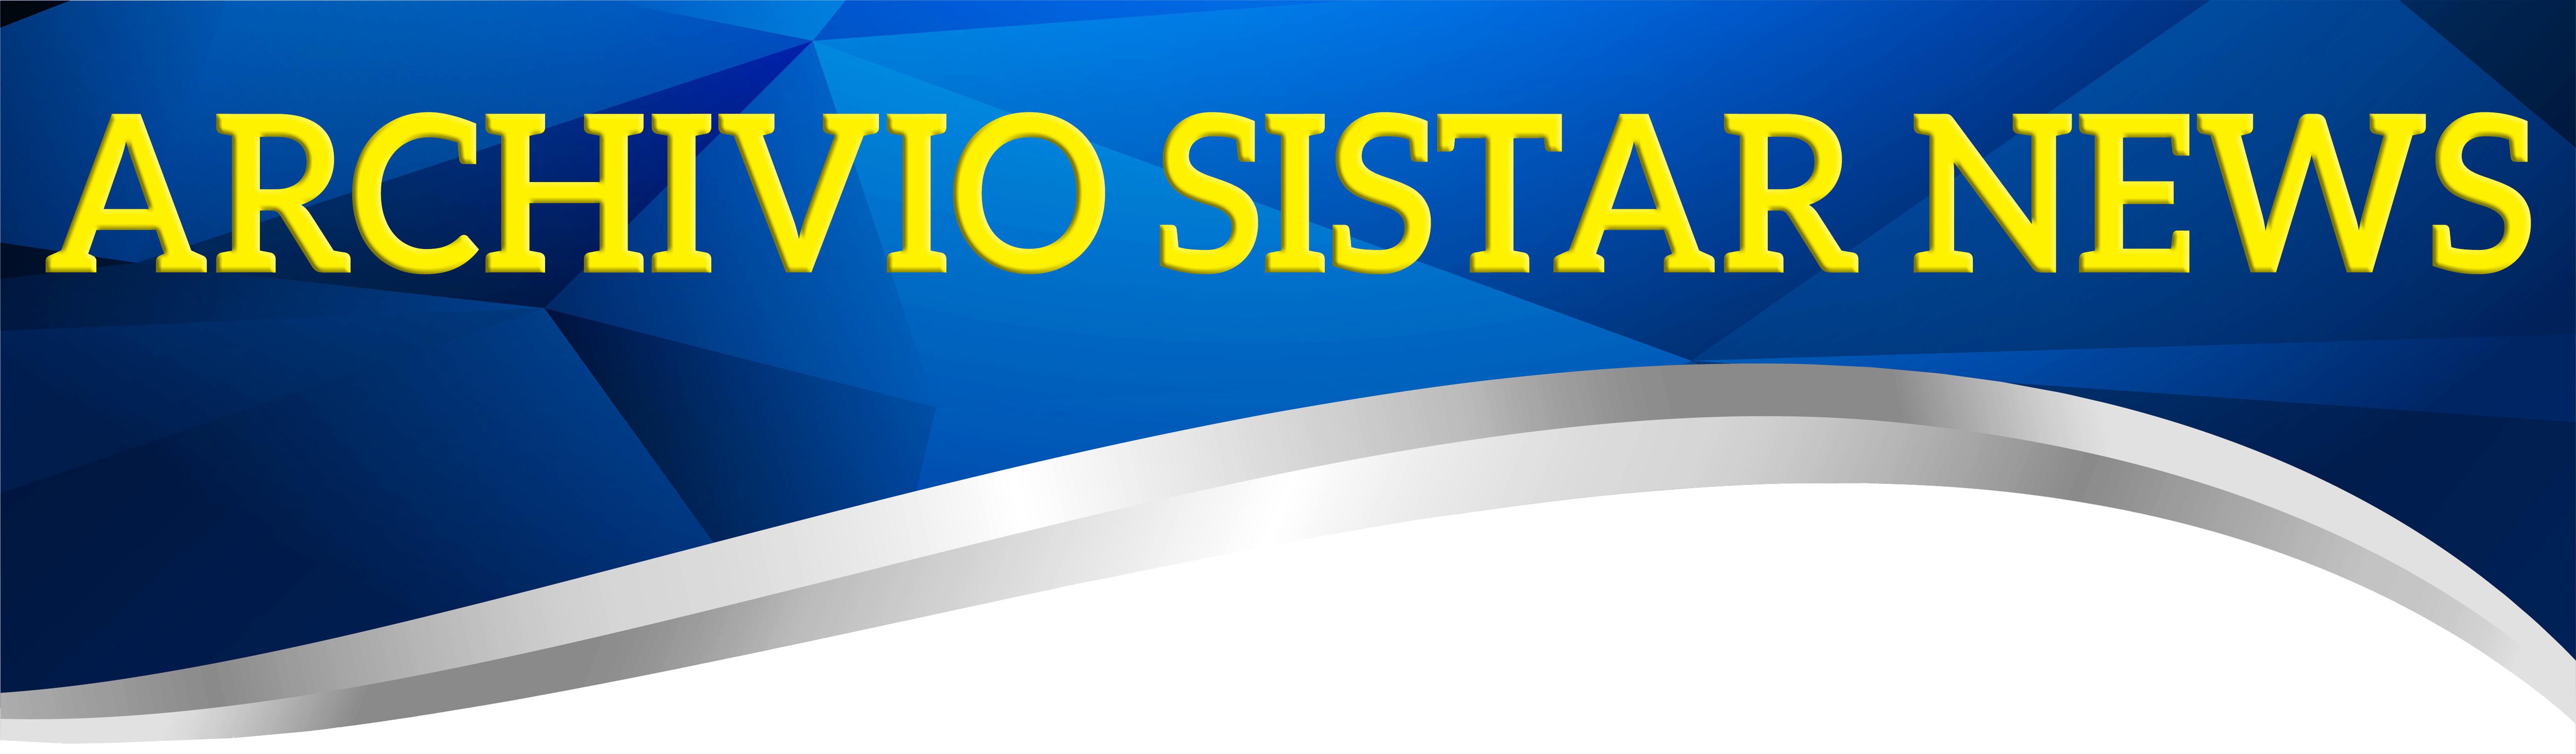 Banner-Archivio-Sistar-News